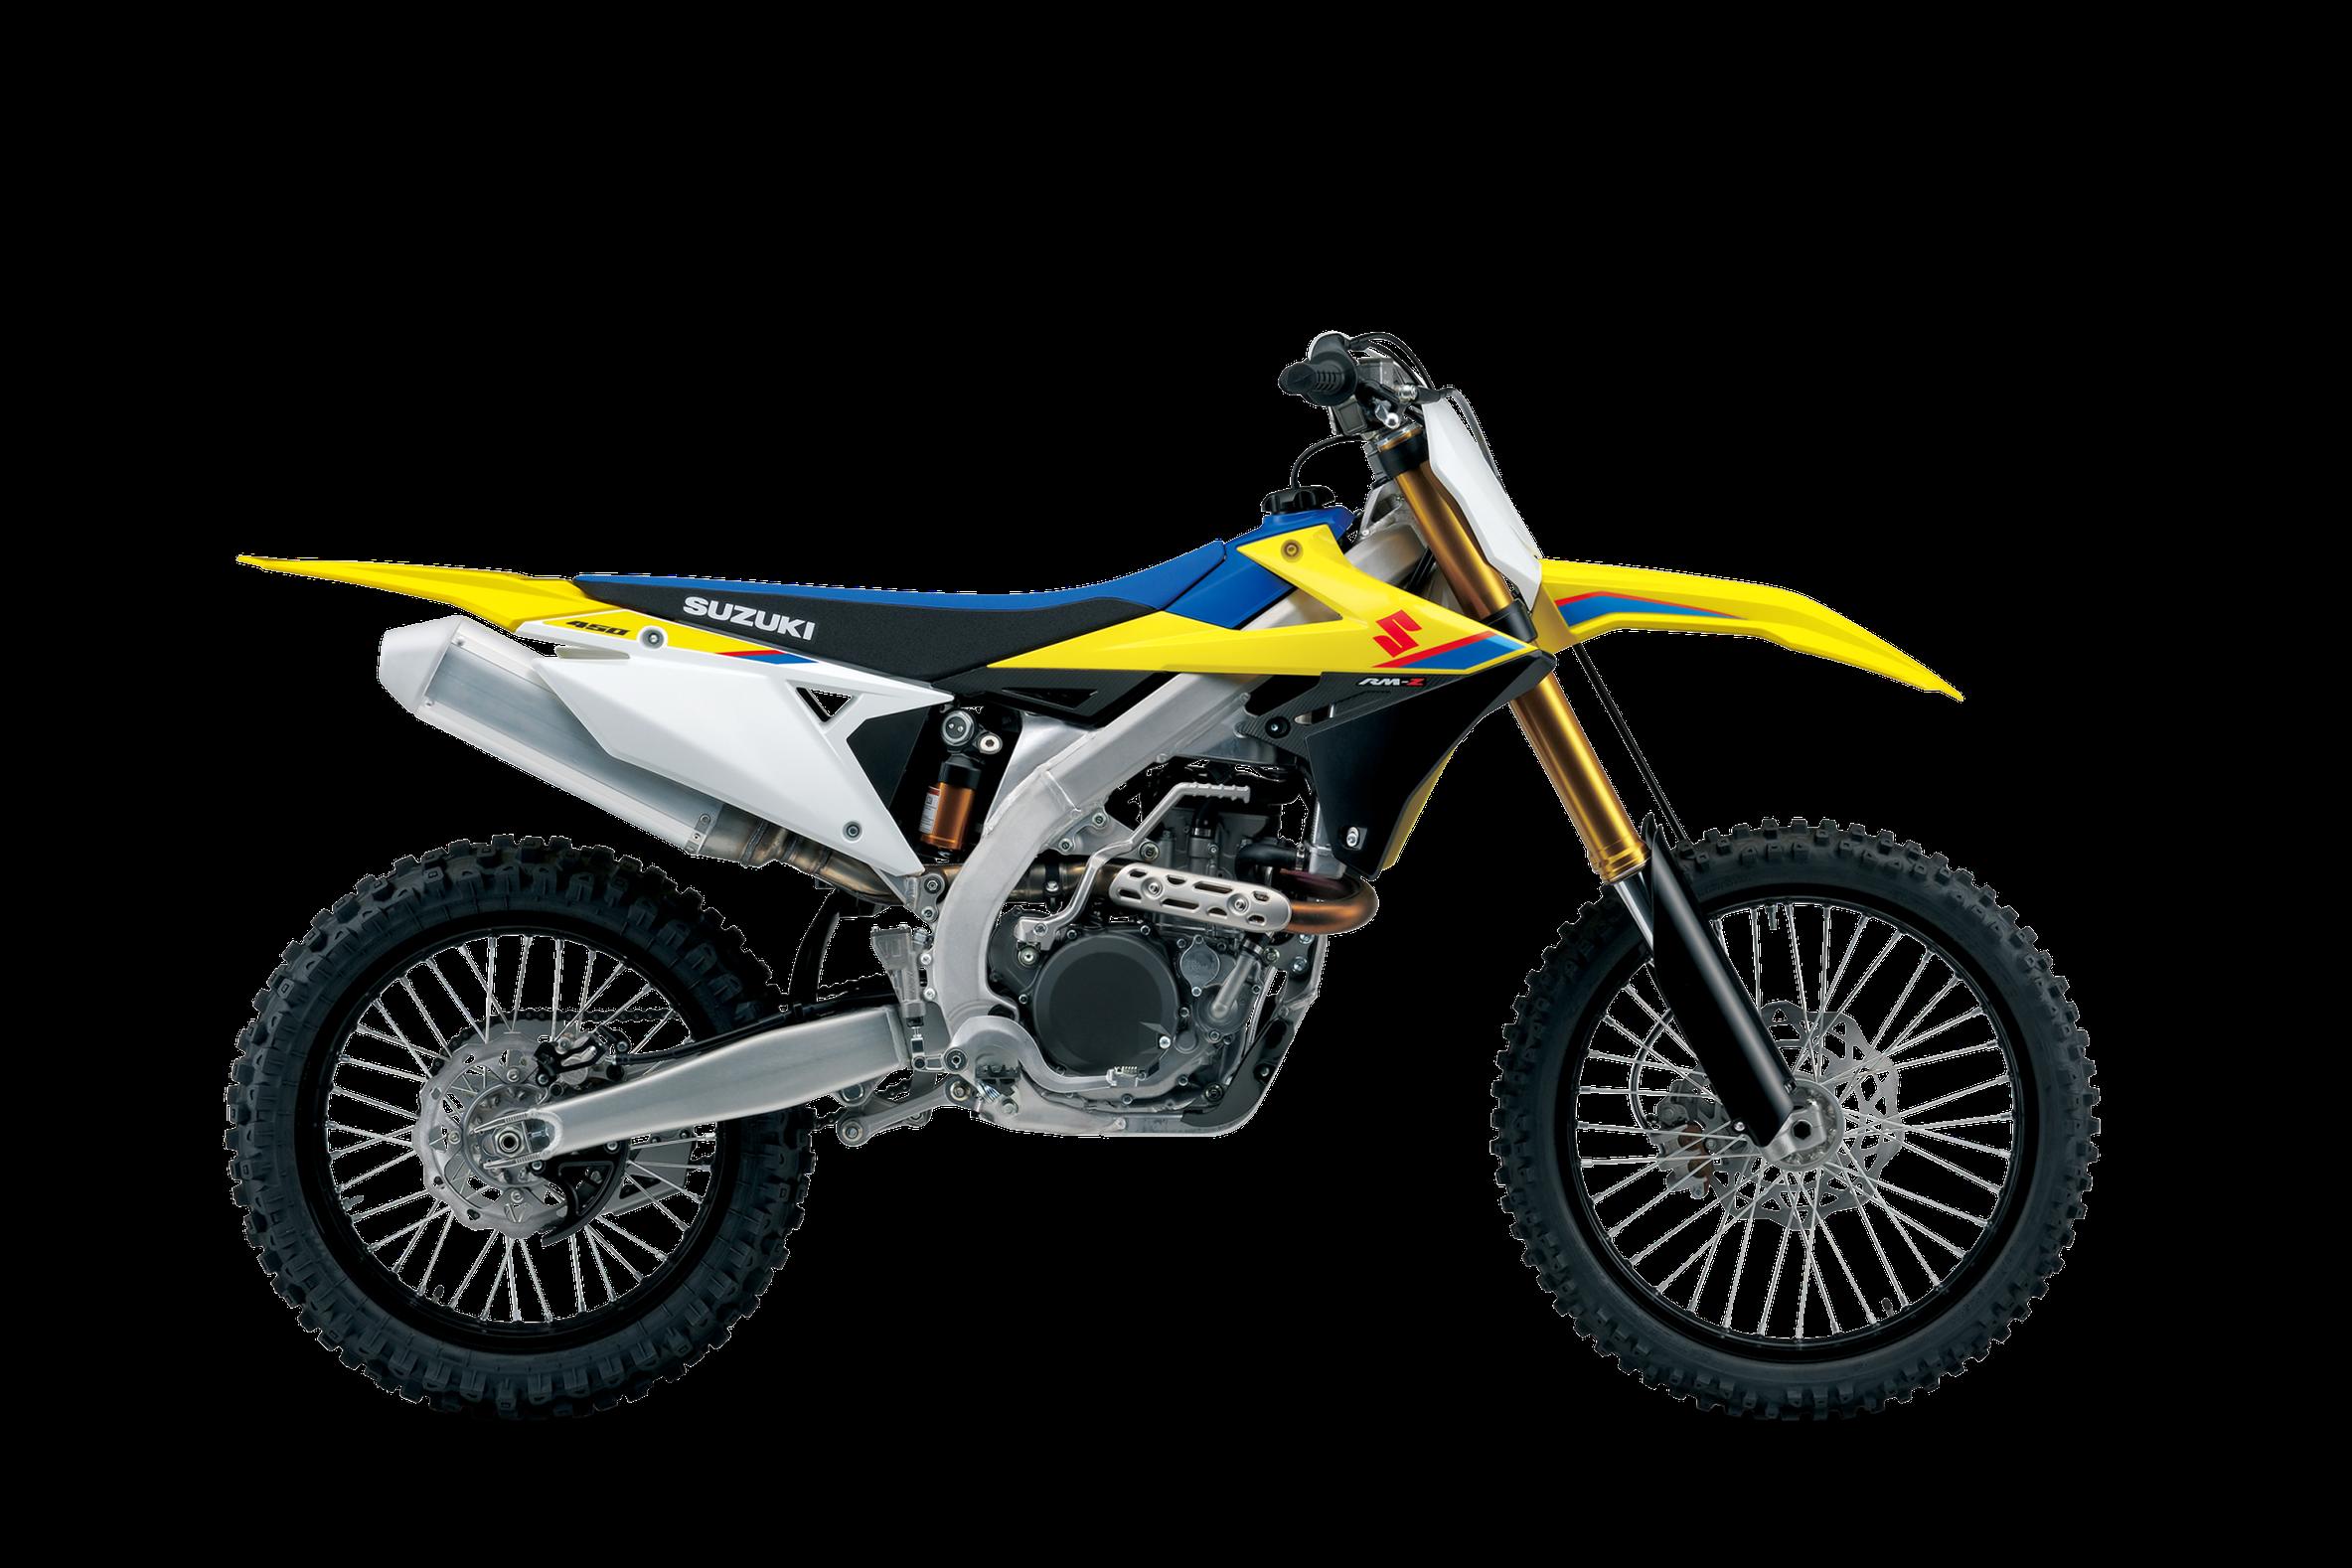 50 New 2019 Suzuki Motocross Research New for 2019 Suzuki Motocross